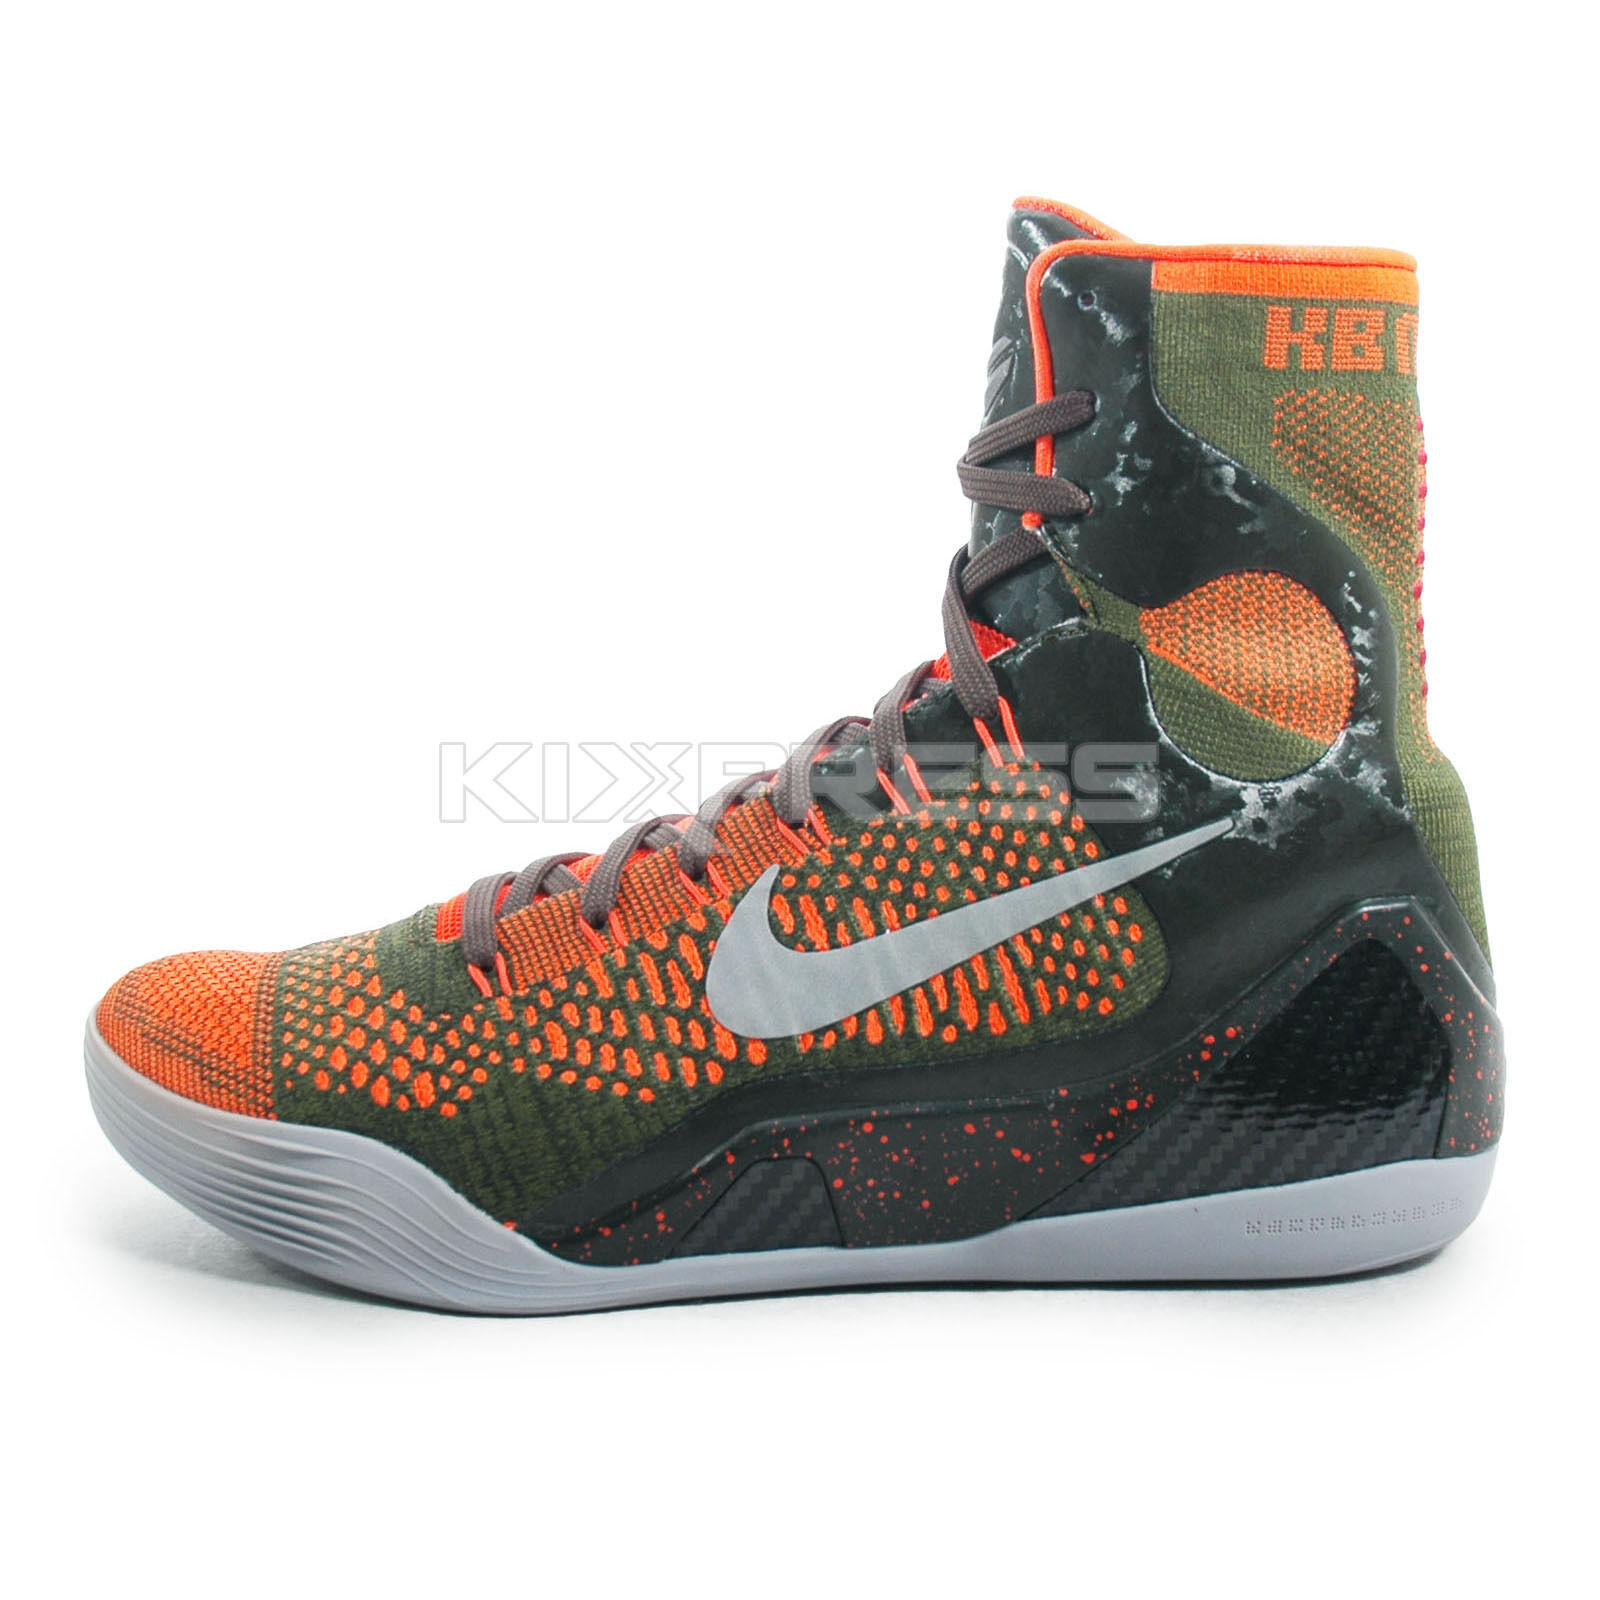 nike basketball kobe ix elite xdr [641714-303] basketball nike - strategie sequoia / rough grün 204f61